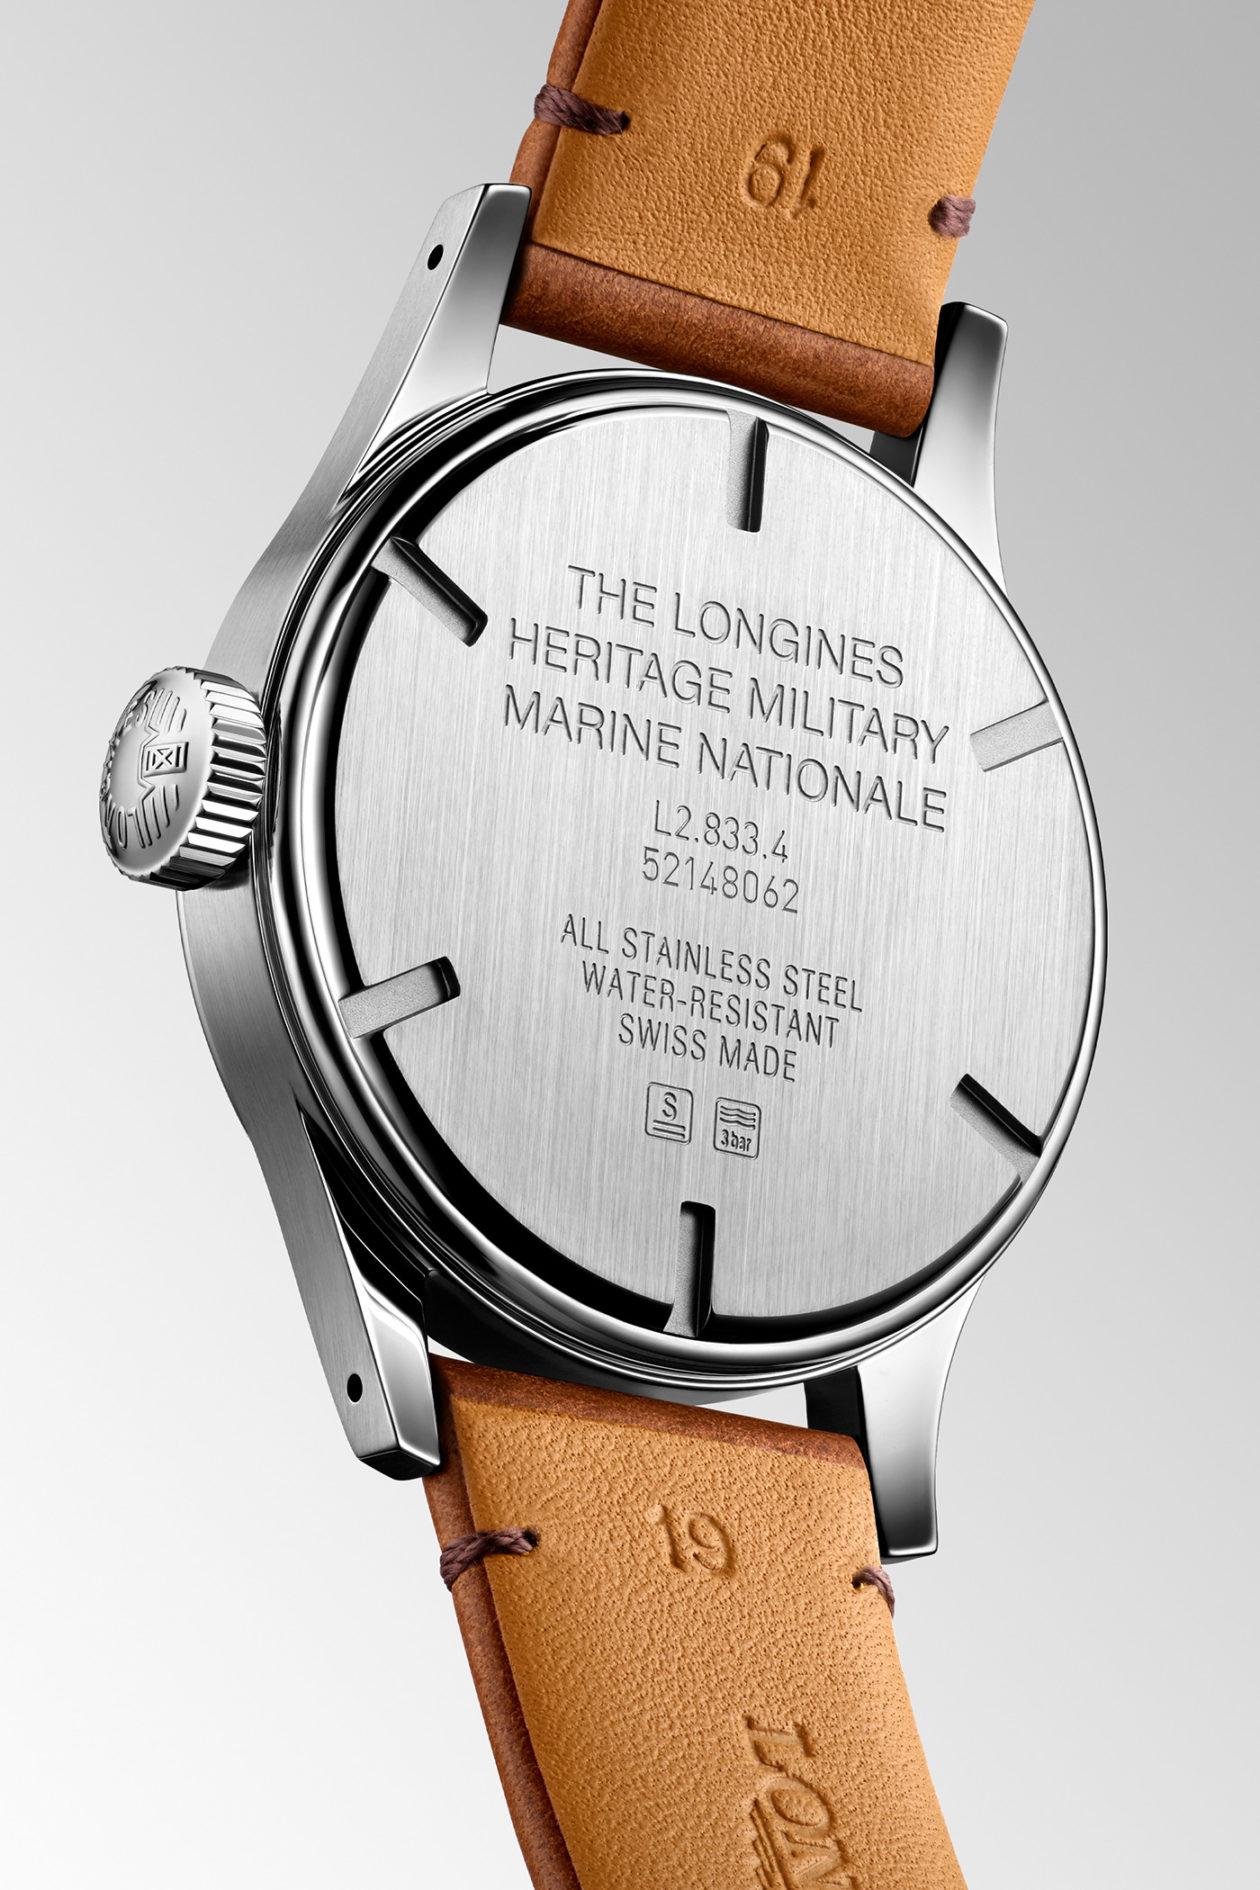 Longines Heritage Military Marine Nationale